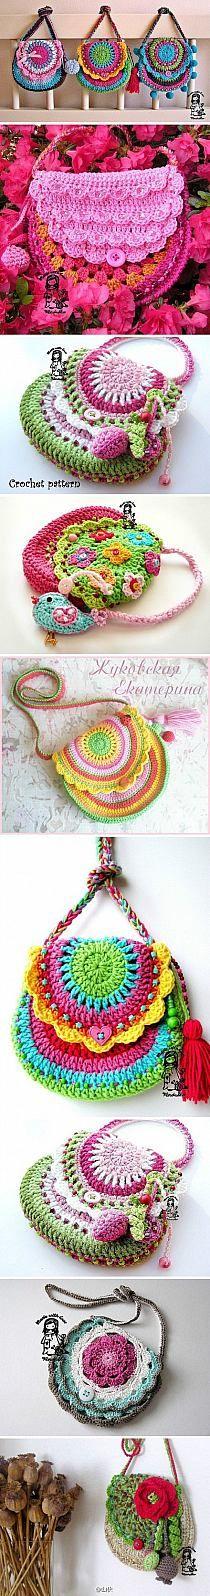 Cute crochet purses for the girls. Knit Or Crochet, Crochet For Kids, Crochet Crafts, Yarn Crafts, Crochet Stitches, Crochet Ideas, Blanket Crochet, Crochet Handbags, Captain Hook